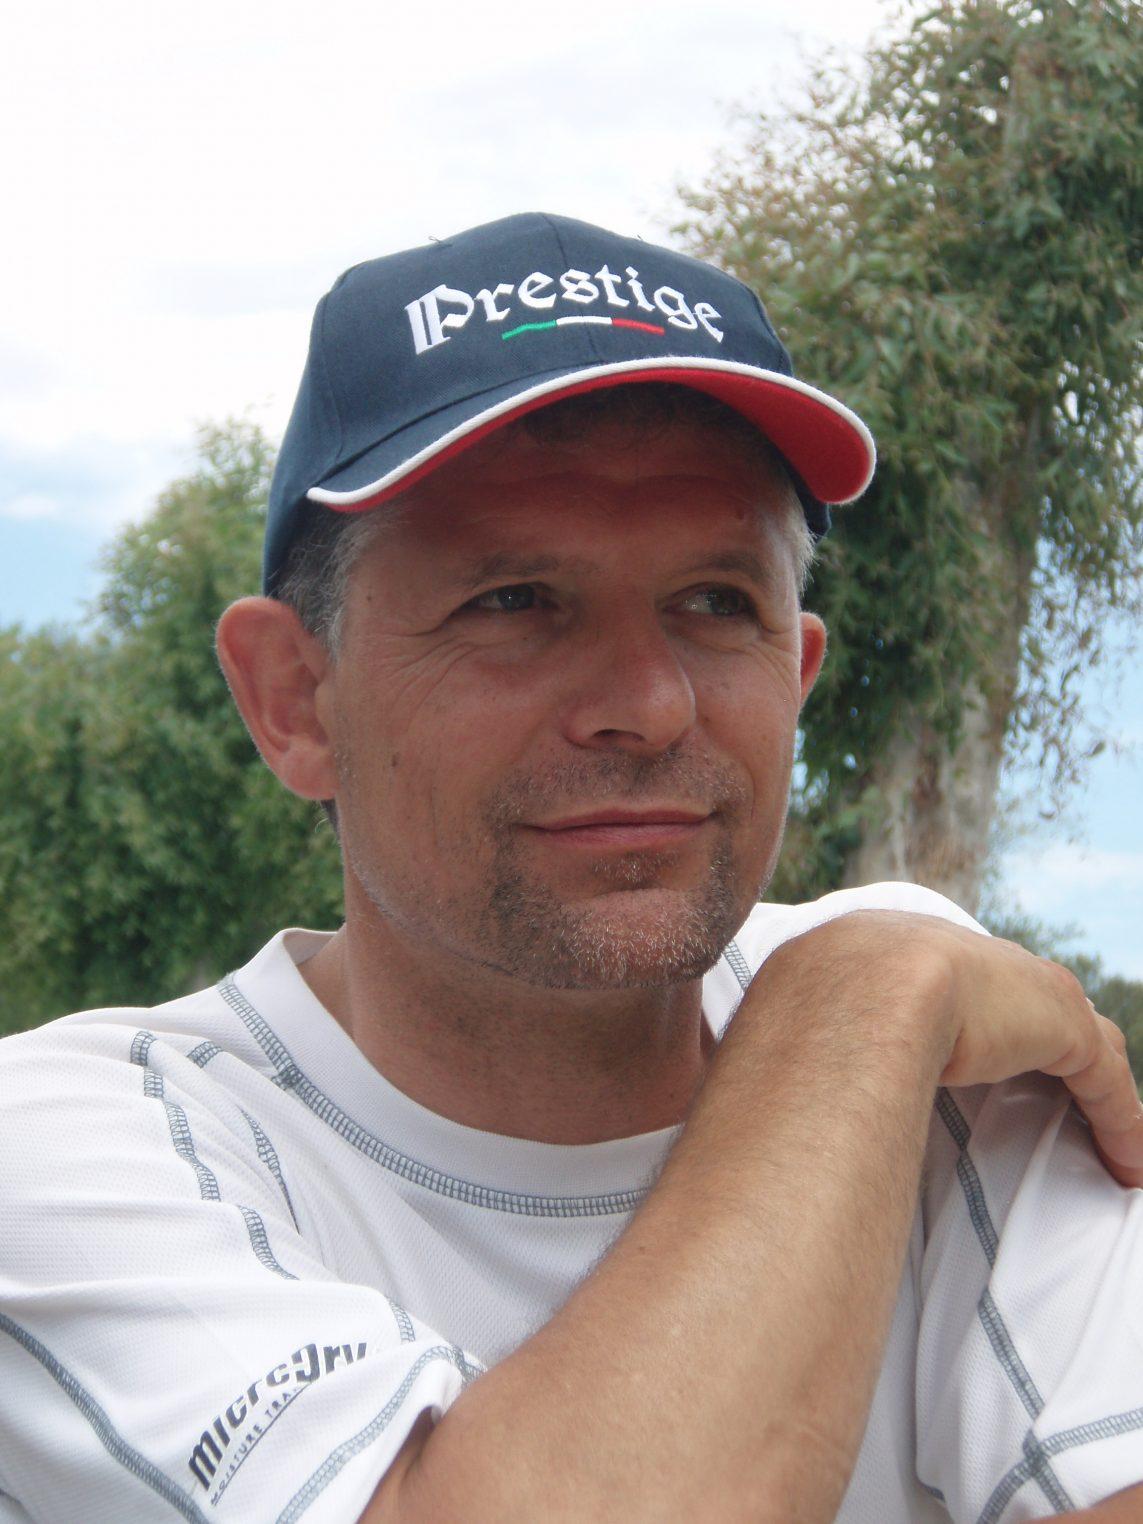 Reitsportsattler - Robert Stark